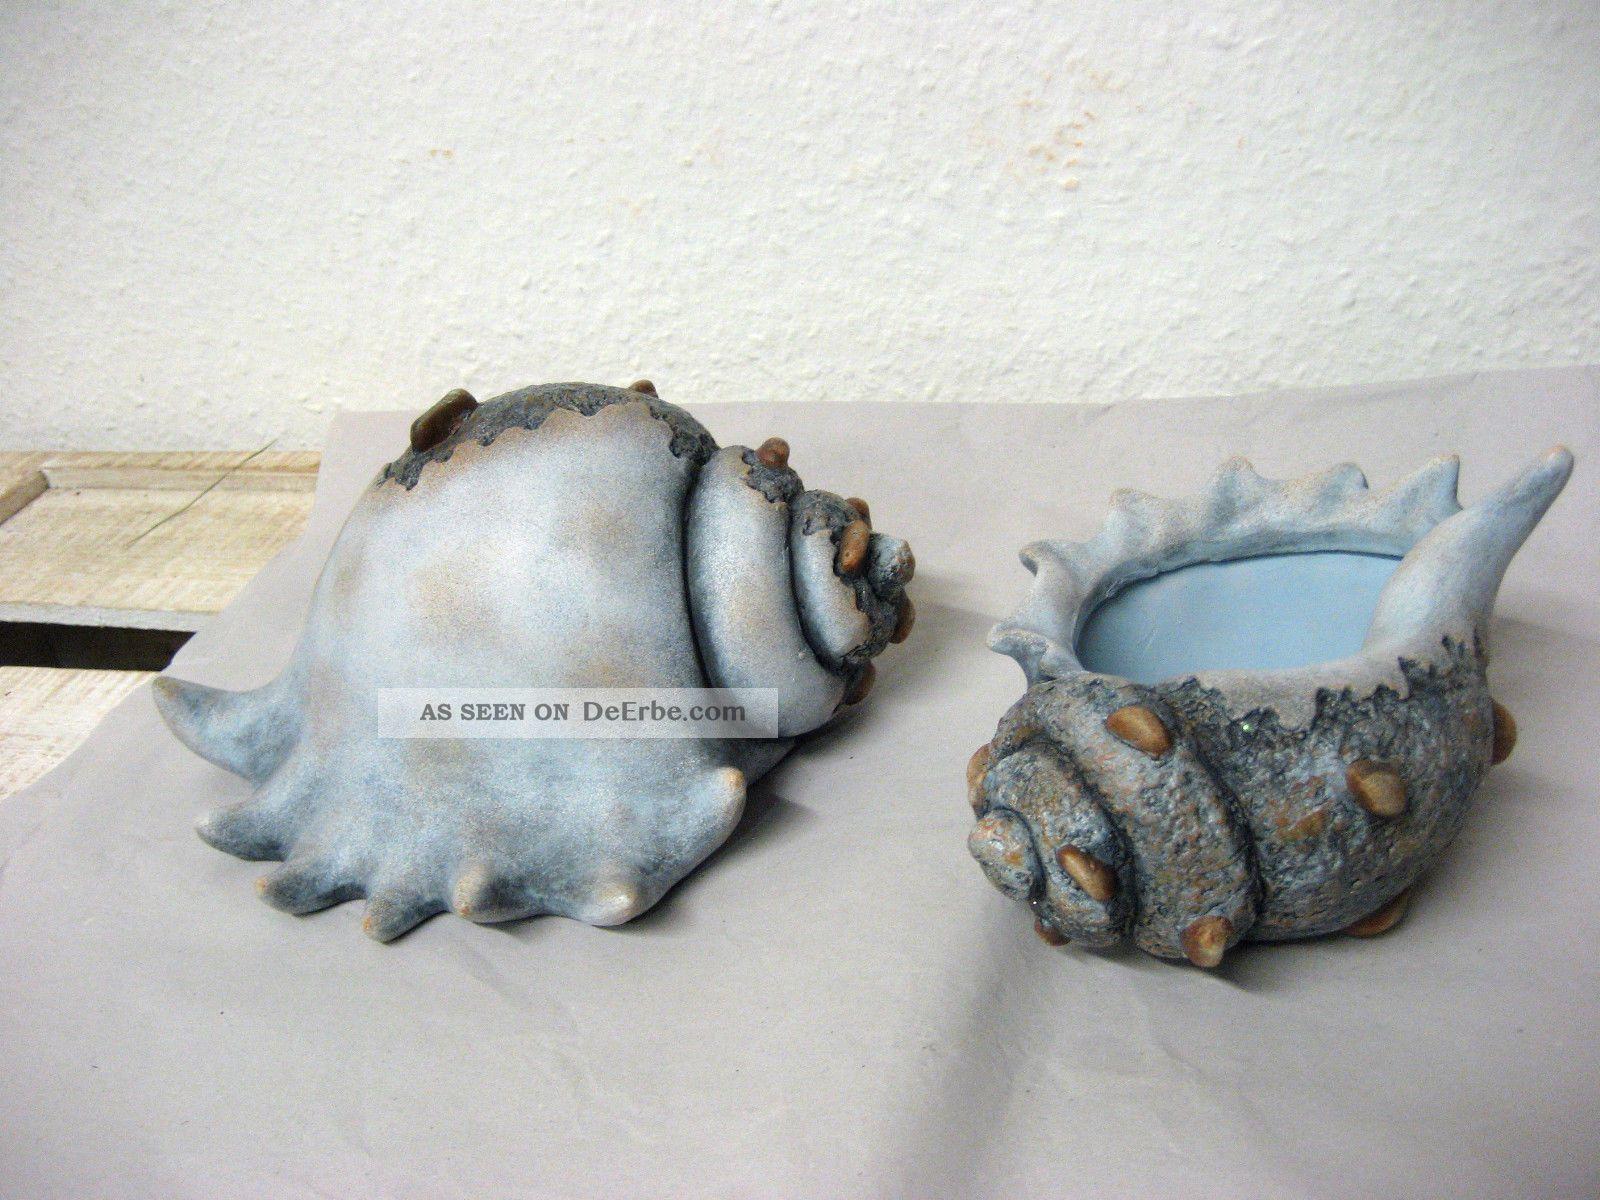 Angebot Dekoration 2 Keramik Muschel Maritim Martime Bad Deko Aquarium Muscheln Muscheln Kunst Aus Treibholz Maritim